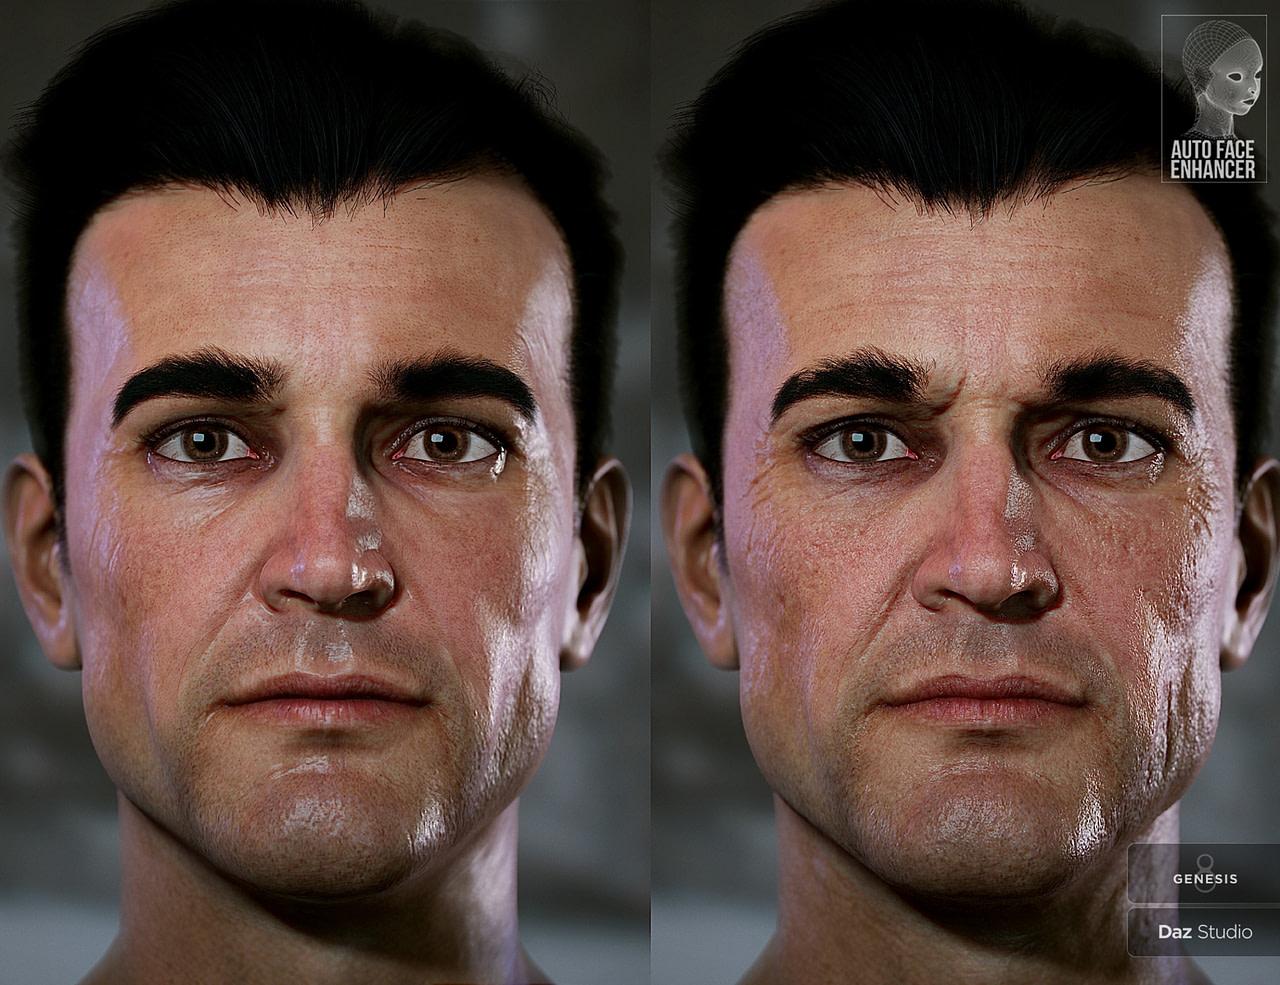 Additional face details by Face Enhancer for daz